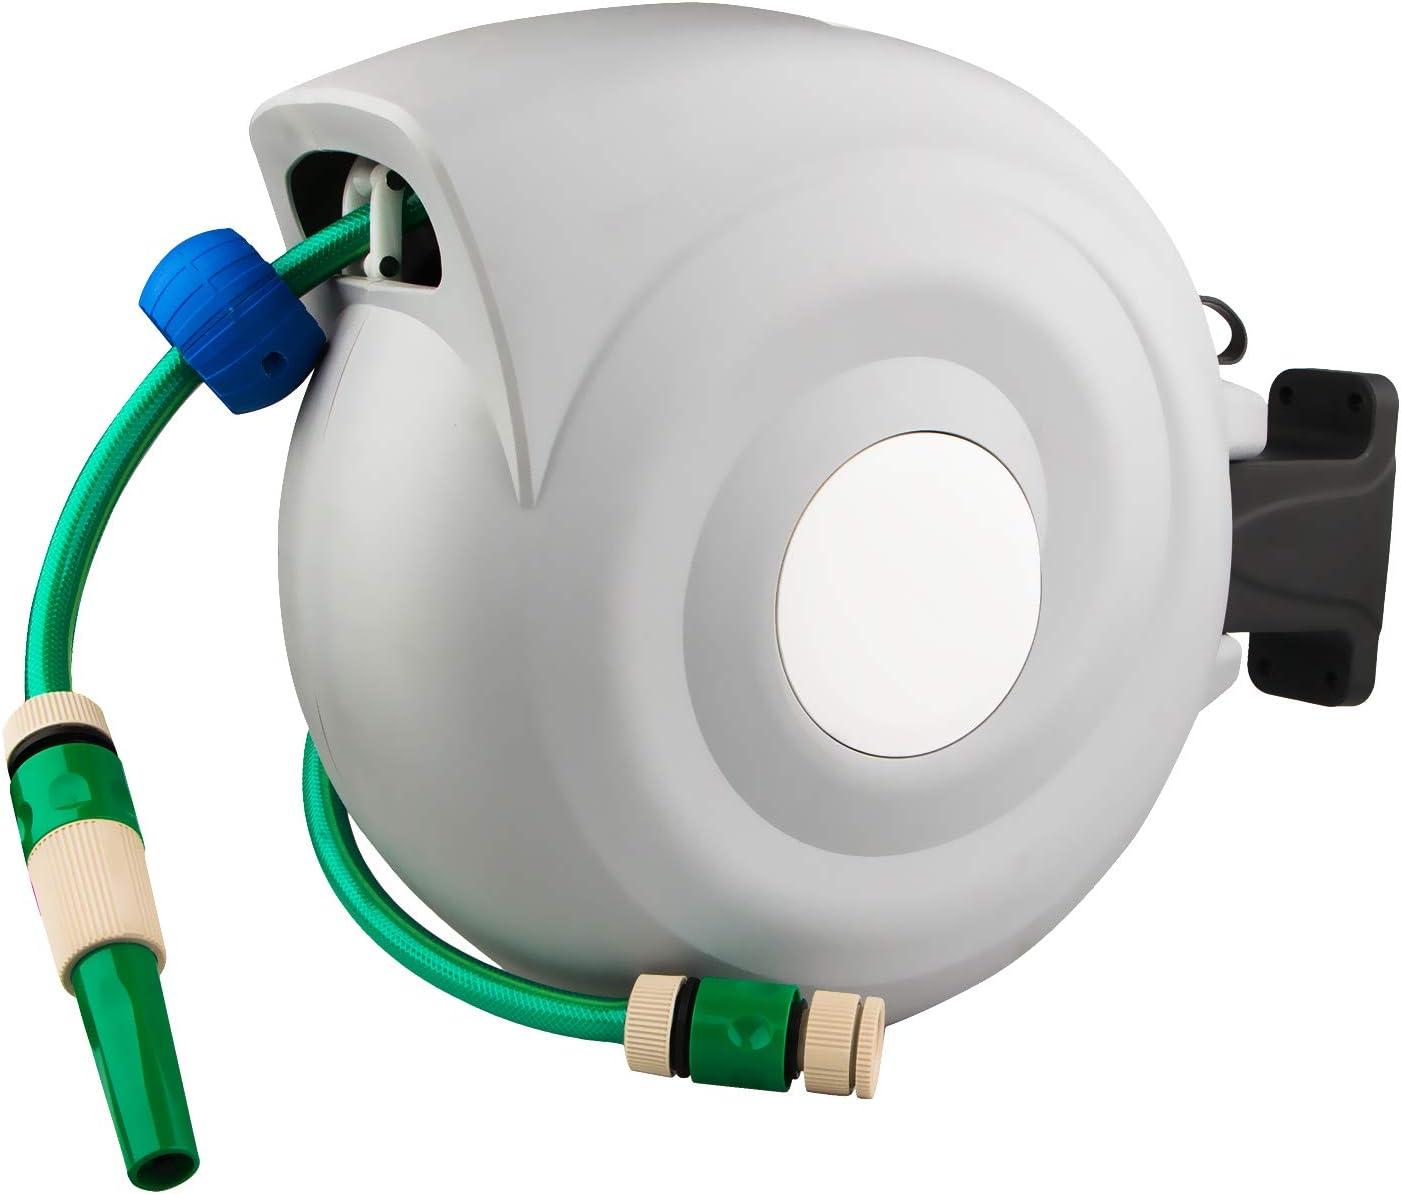 "Toolwiz Garden Hose Reel, Retractable Hose Reel 3/4"" x 65+6.5 FT, Water Hose with 3 Adjustable Water Sprayer Gun Hybrid Hose Automatic Rewind & Wall Mount"